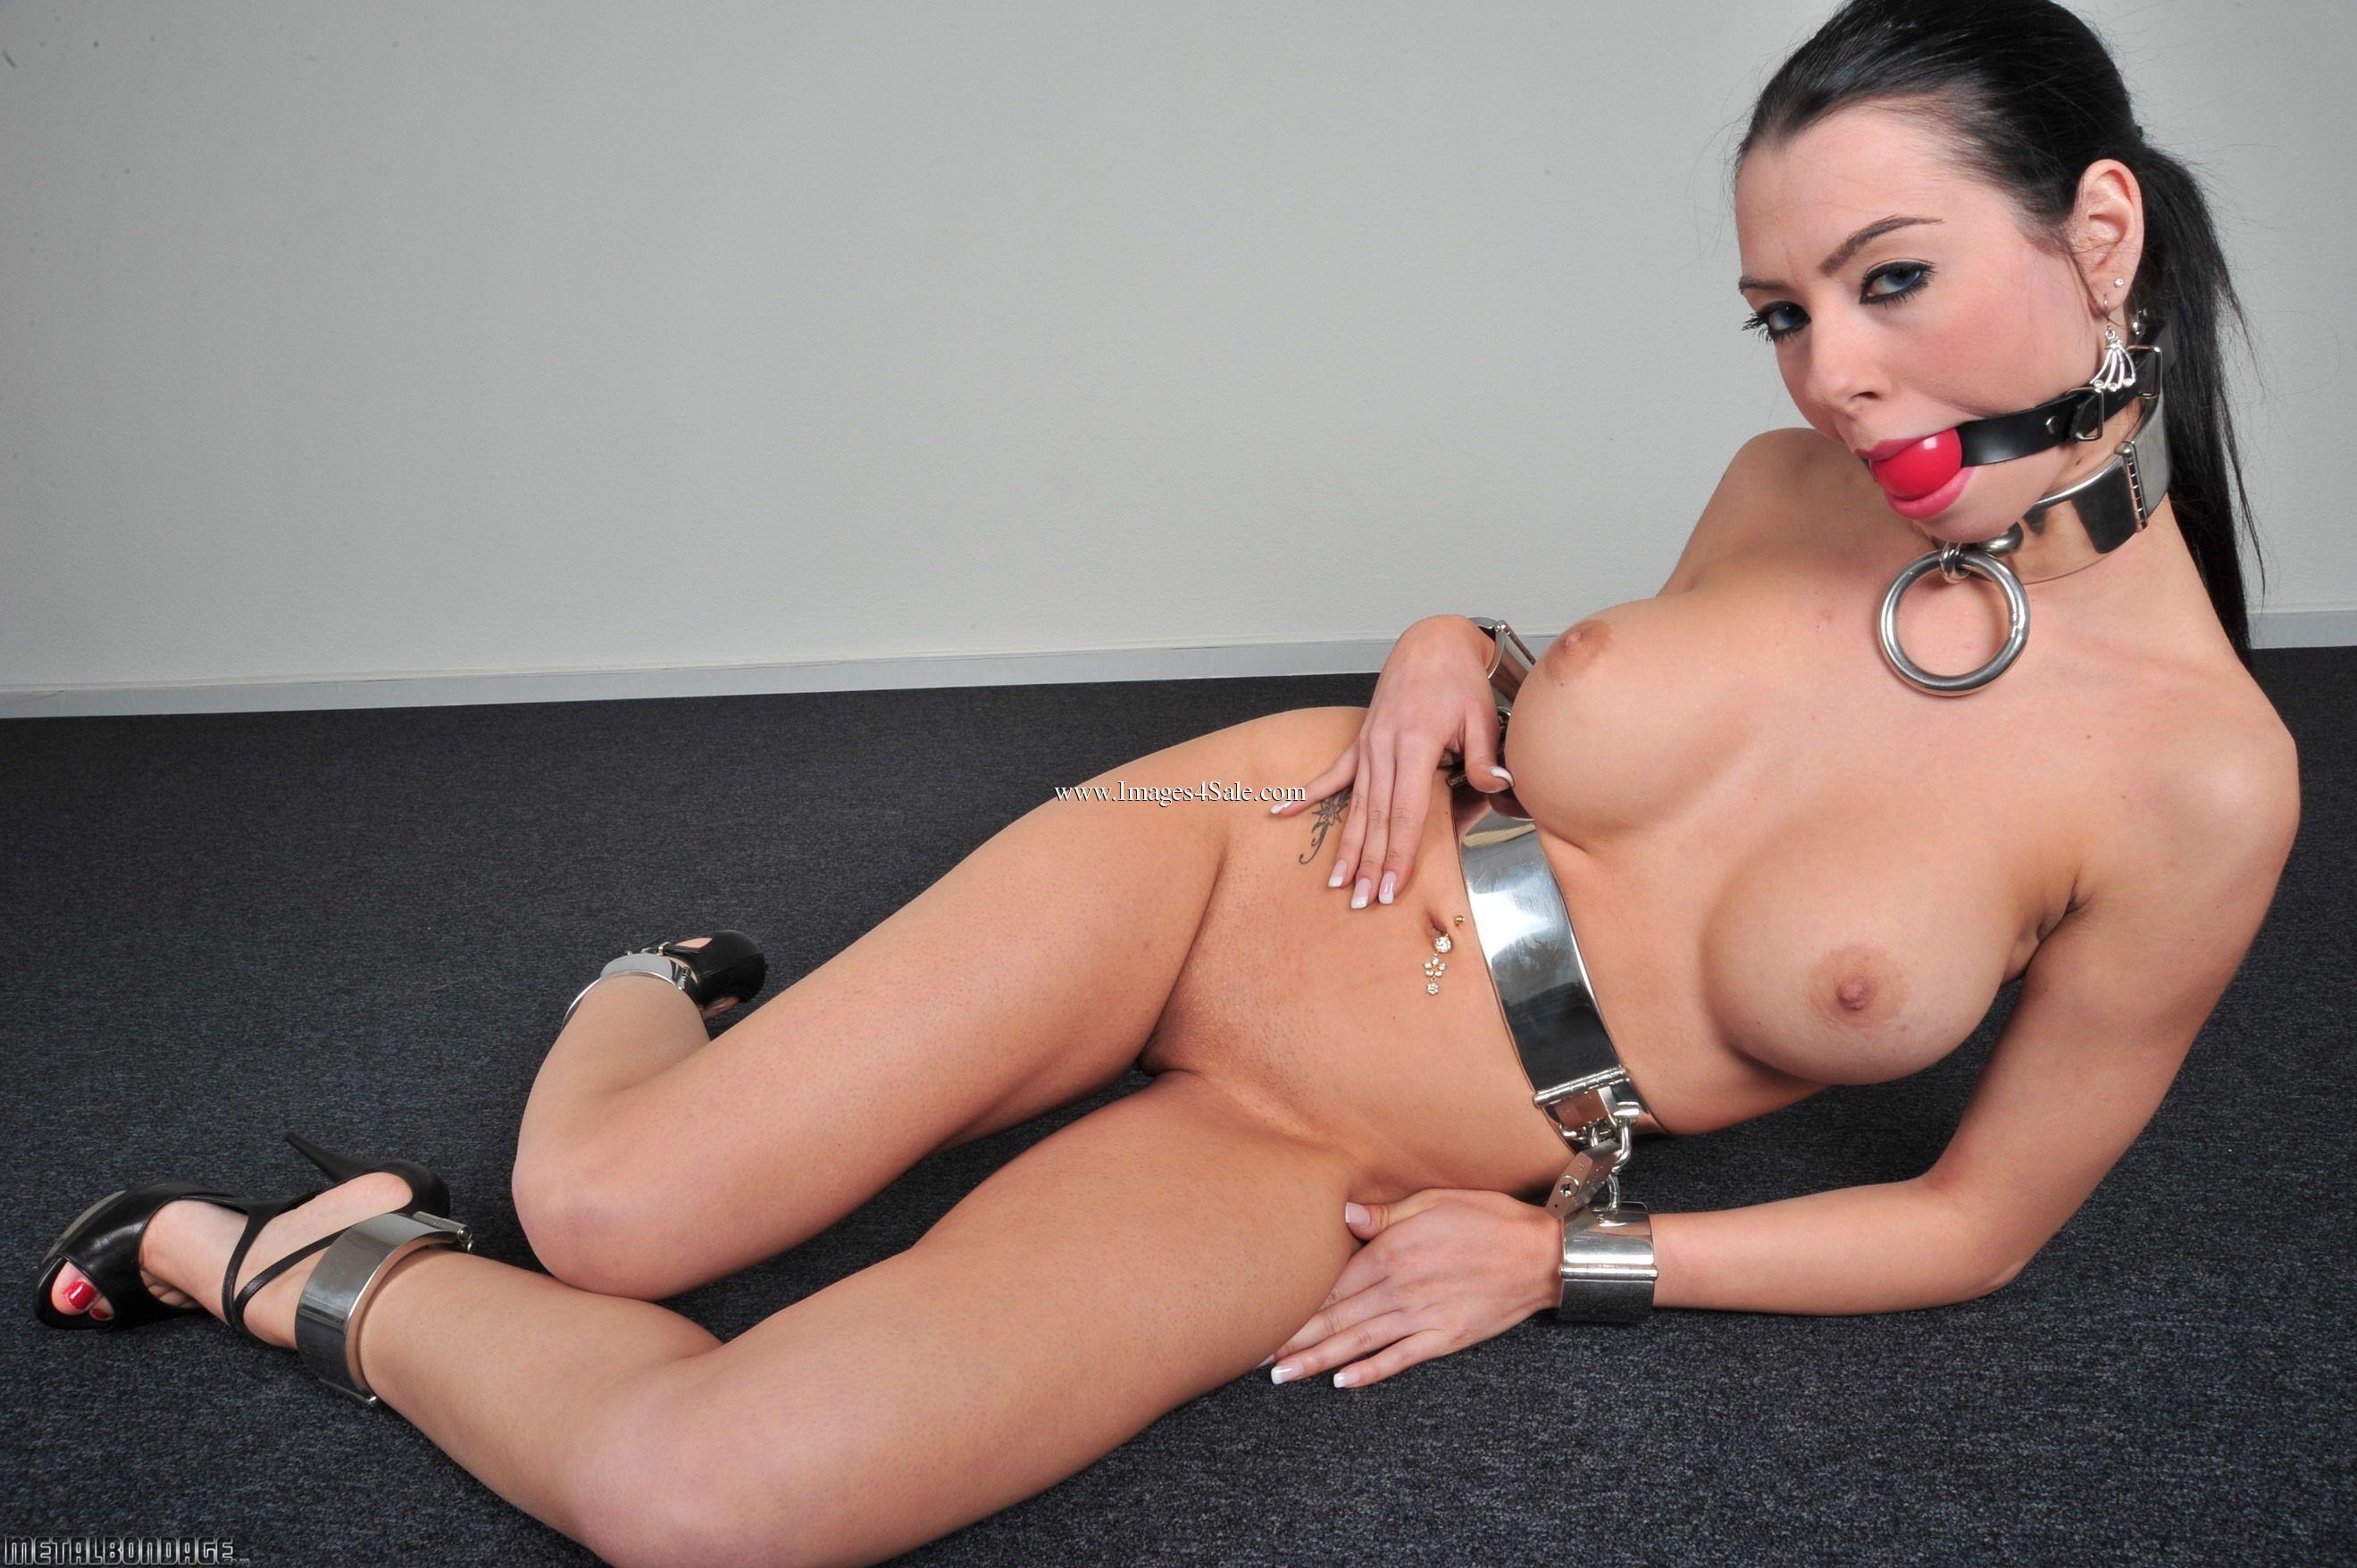 best of Bdsm women Nude